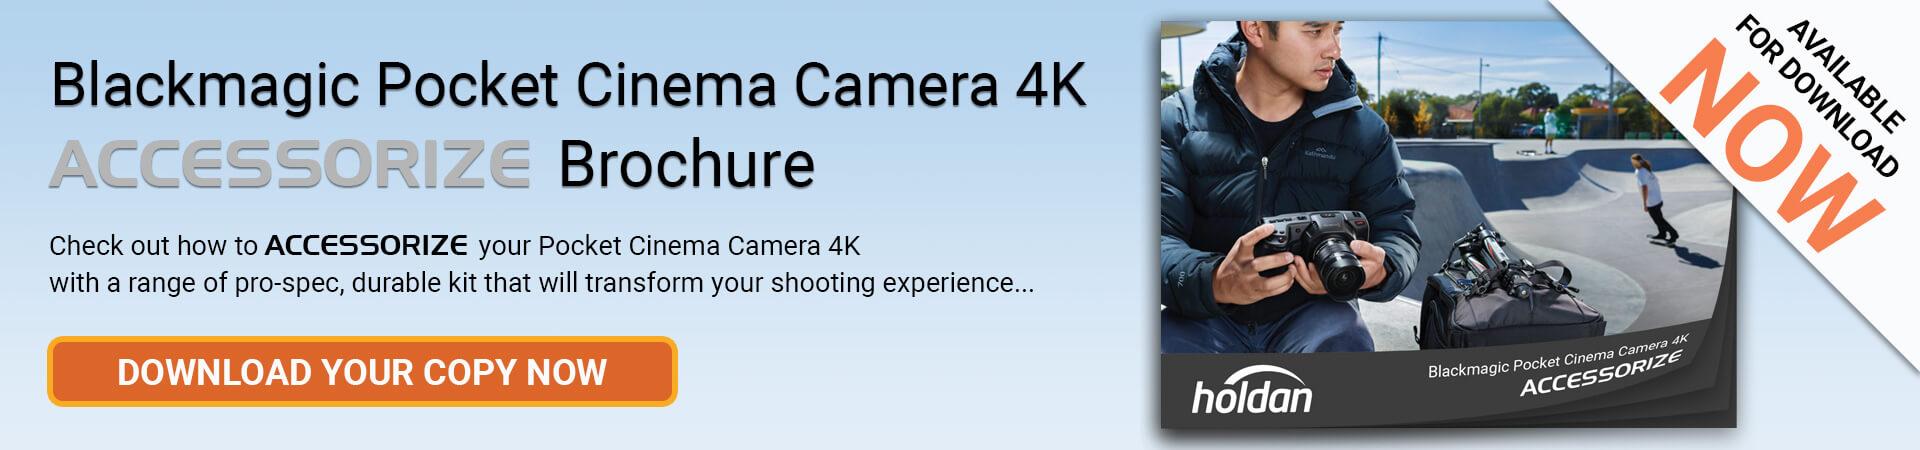 Blackmagic Pocket Cinema Camera Accessorize Brochure